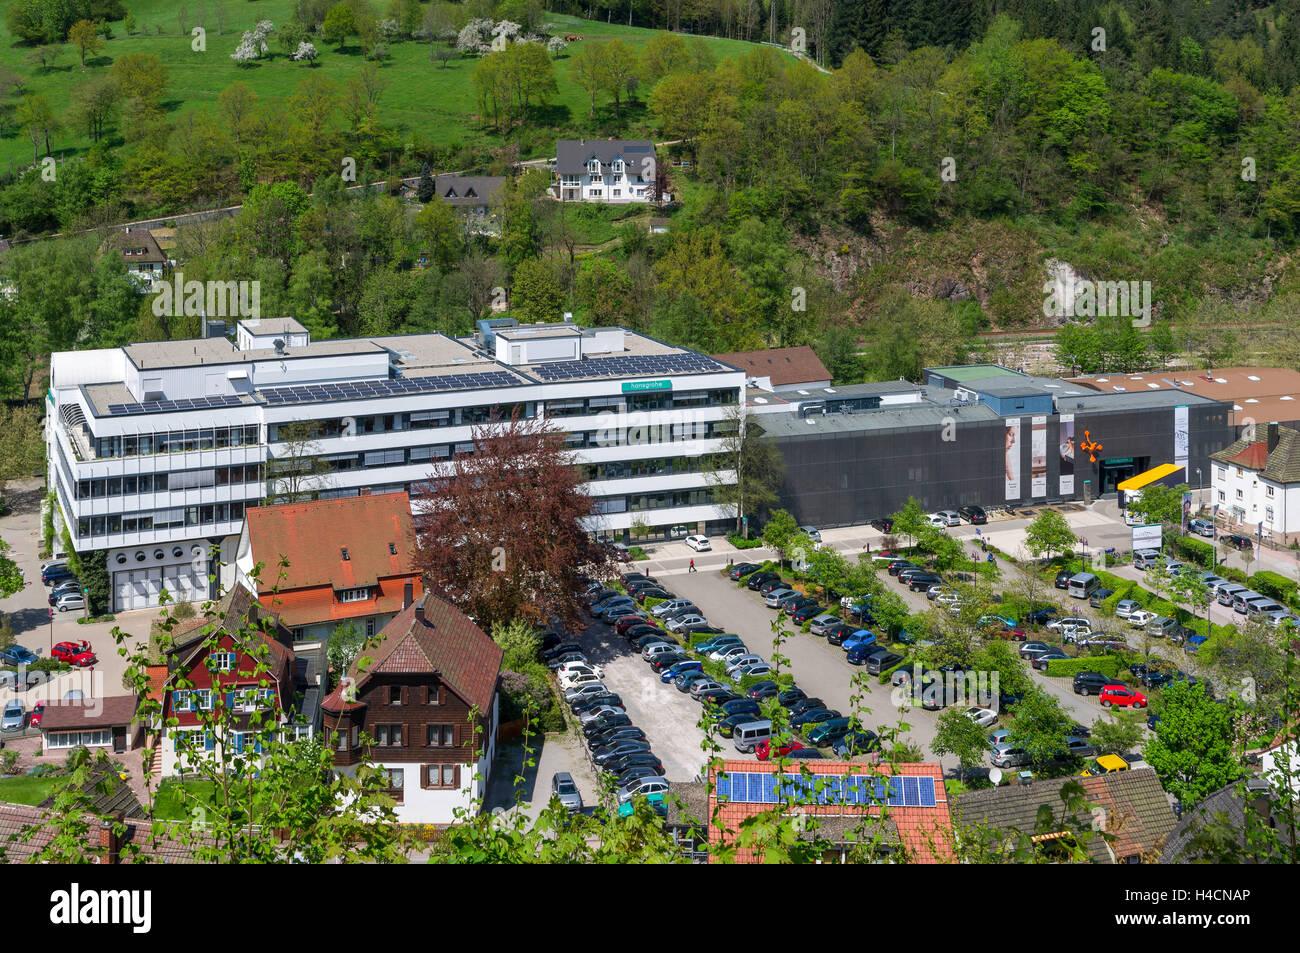 Hansgrohe Stock Photos & Hansgrohe Stock Images - Alamy